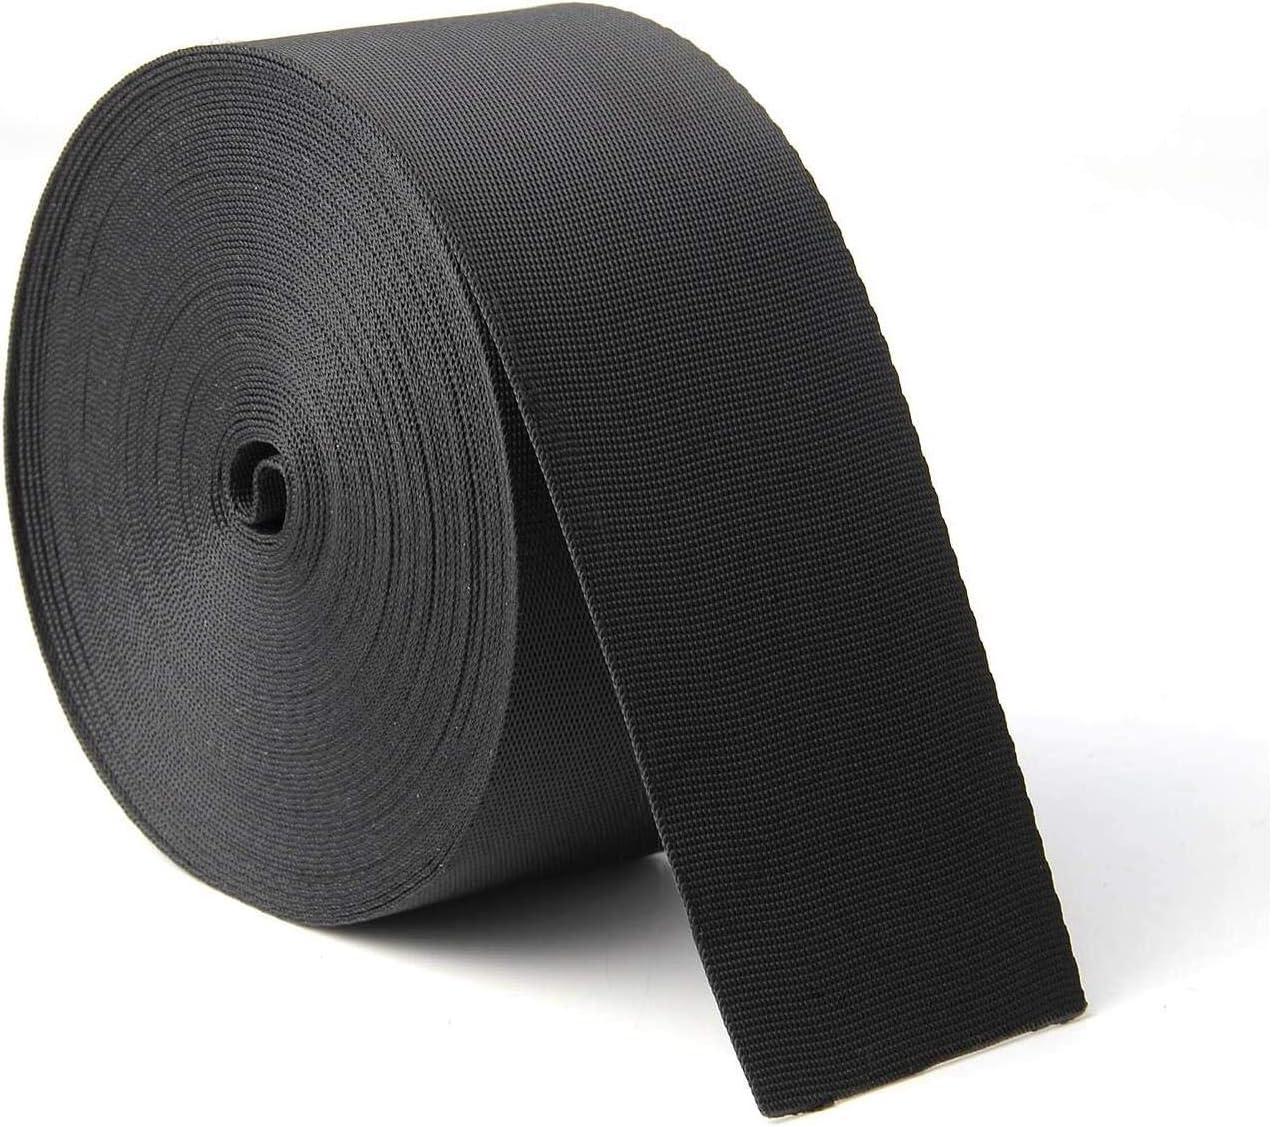 JIAKAI 2 Inch Wide 10 Yards Nylon Heavy Duty Webbing Strap,Polypropylene Heavy Straps for Bags, Hammocks, Outdoor Climbing and DIY Making Luggage Strap, Pet Collar, Backpack Repairing (Black)